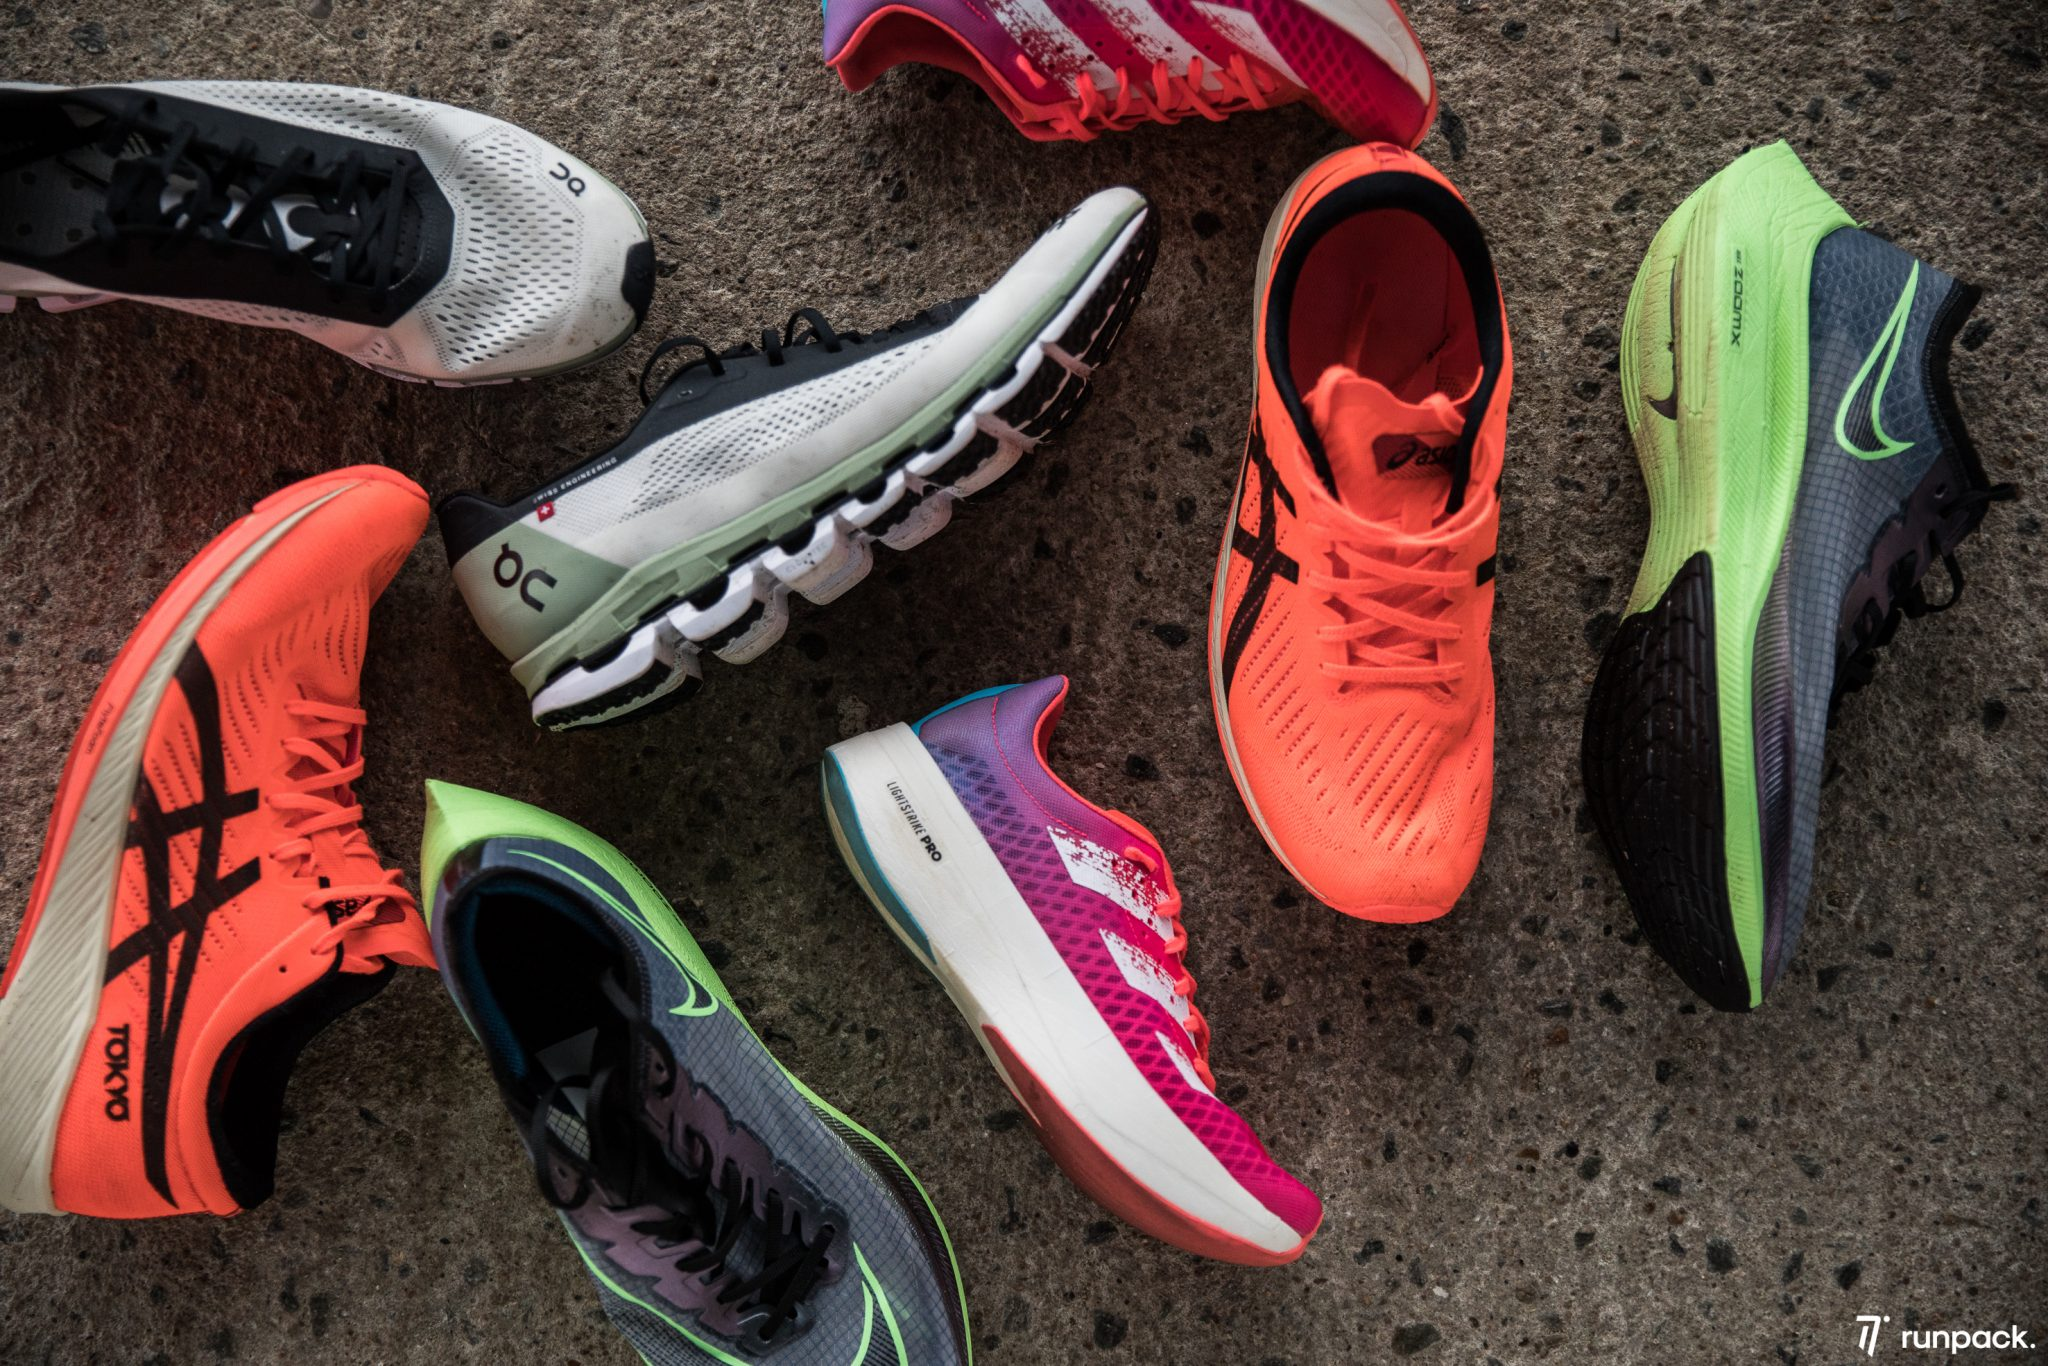 quelle est la meilleure chaussure de running runpack